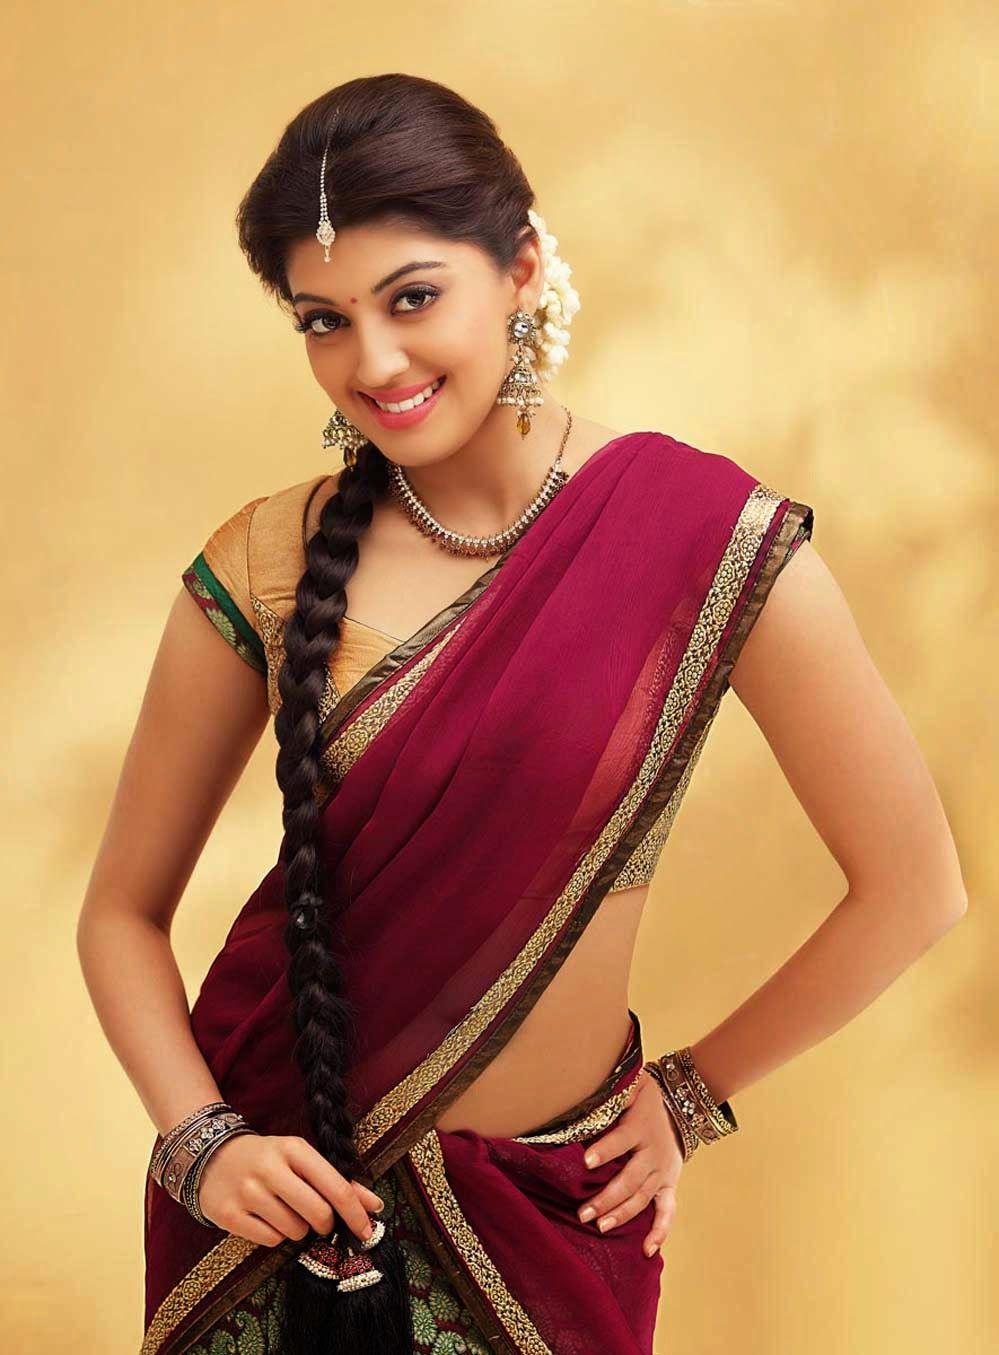 Pranitha Subhash Telugu Actress Latest Hd Images In Saree Indian